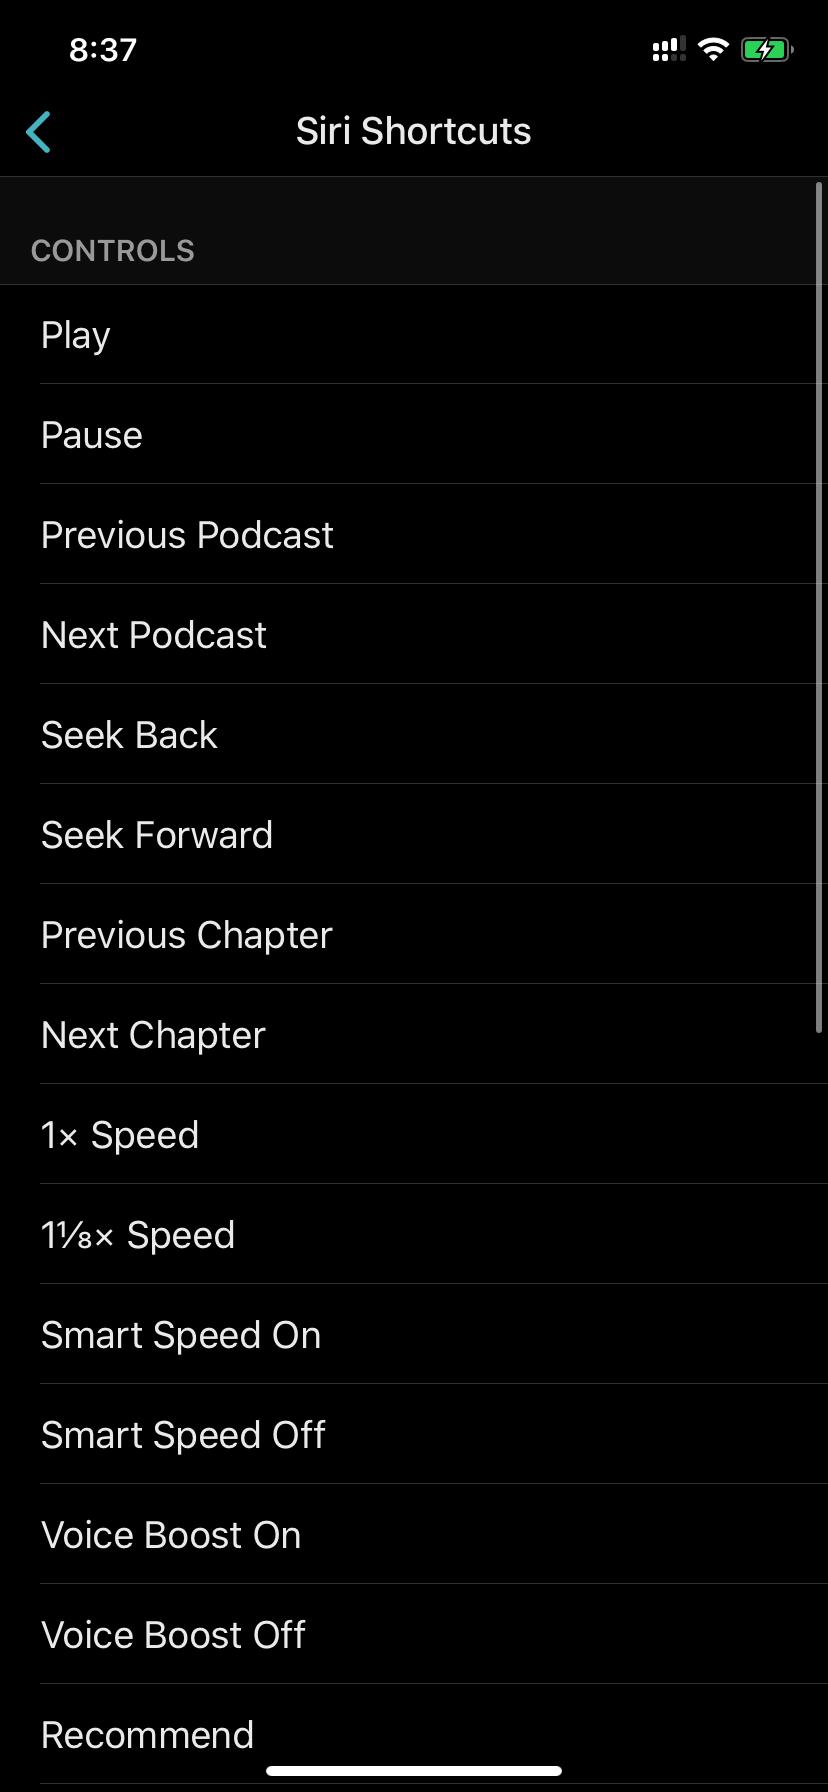 Ovecast Siri